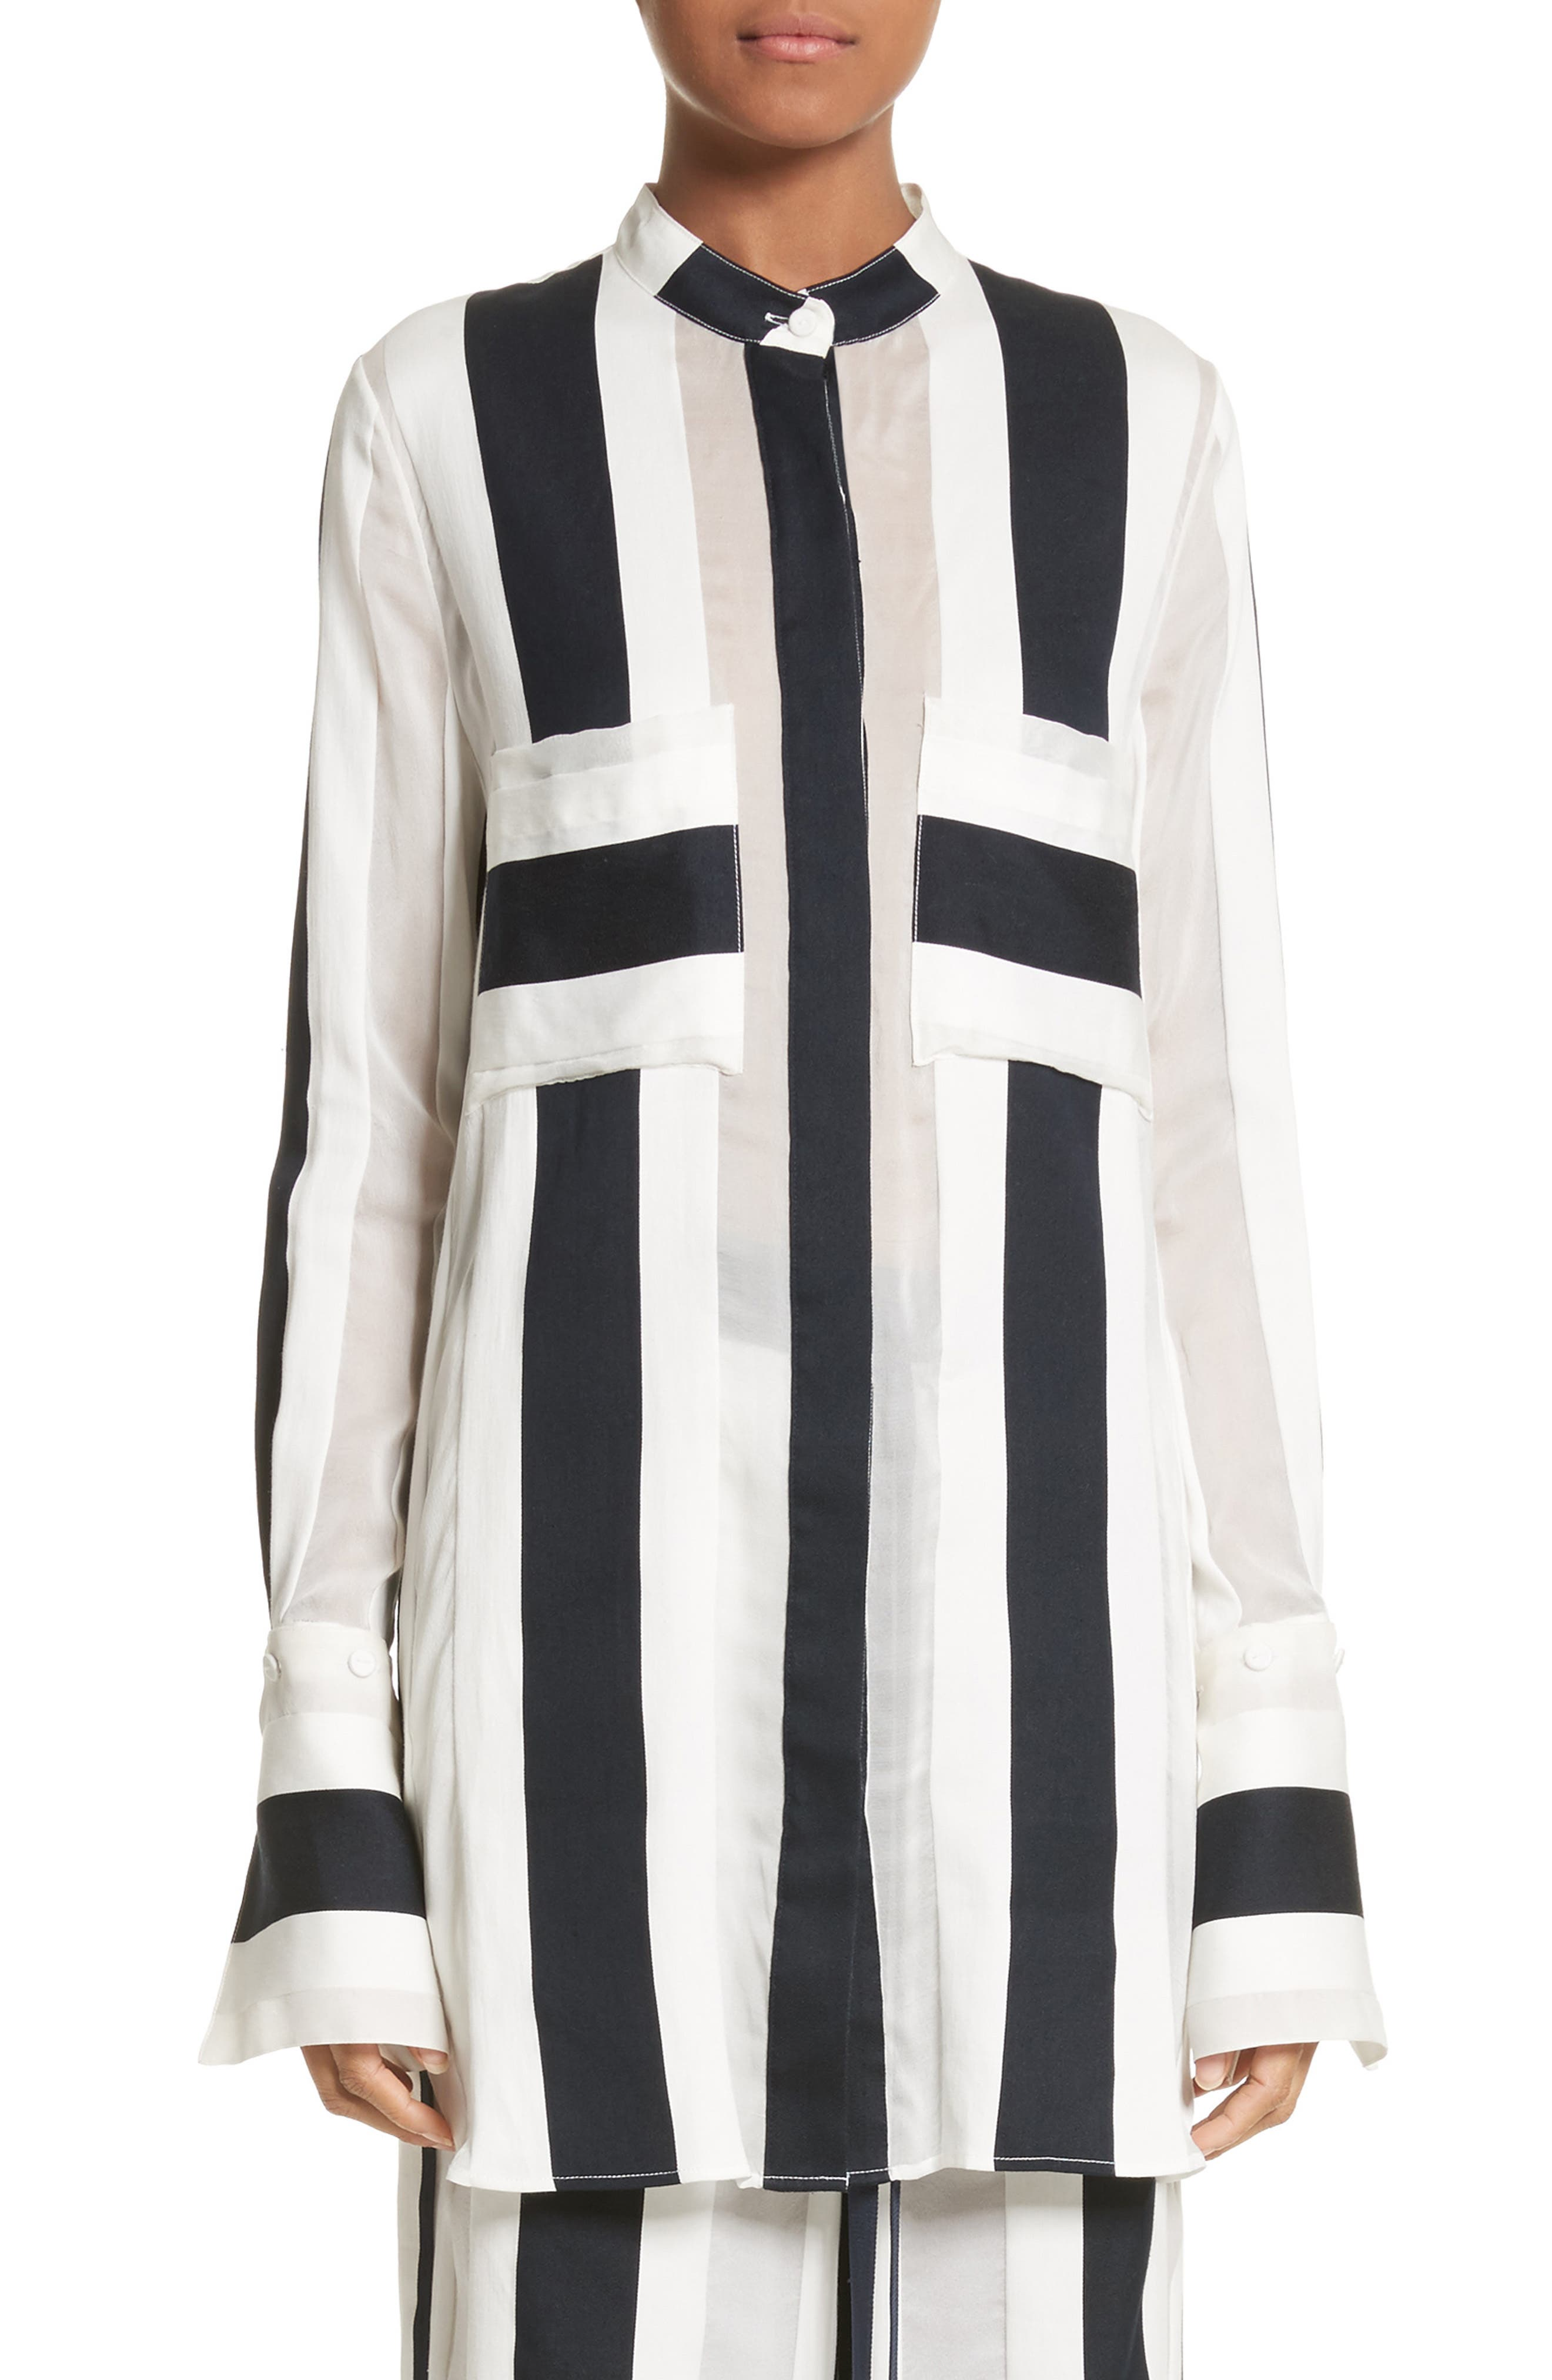 Cotton & Silk Stripe Jacquard Blouse,                         Main,                         color, Black/ White